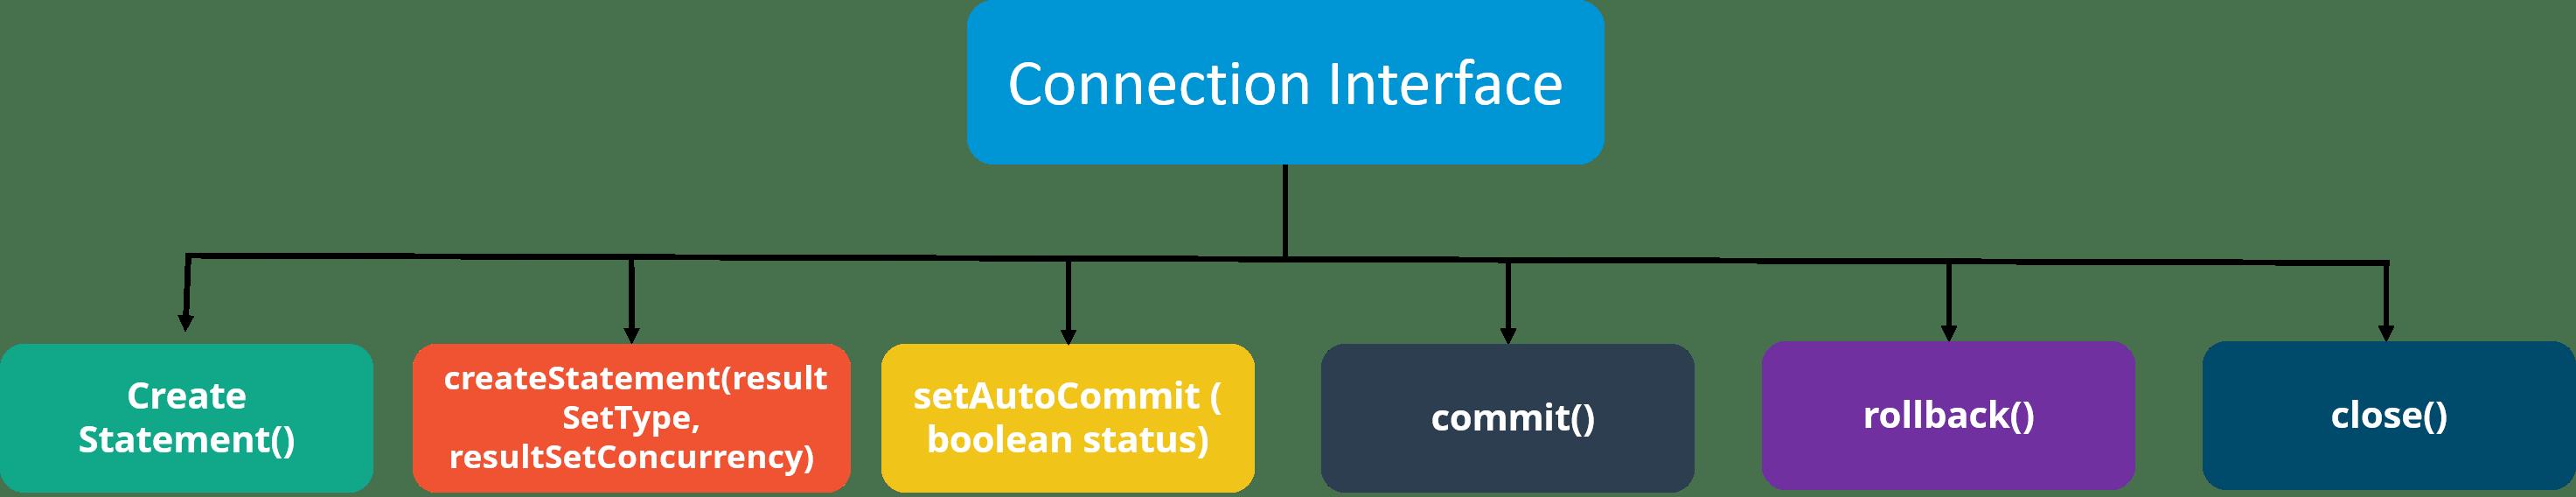 Java JDBC Connection Interface